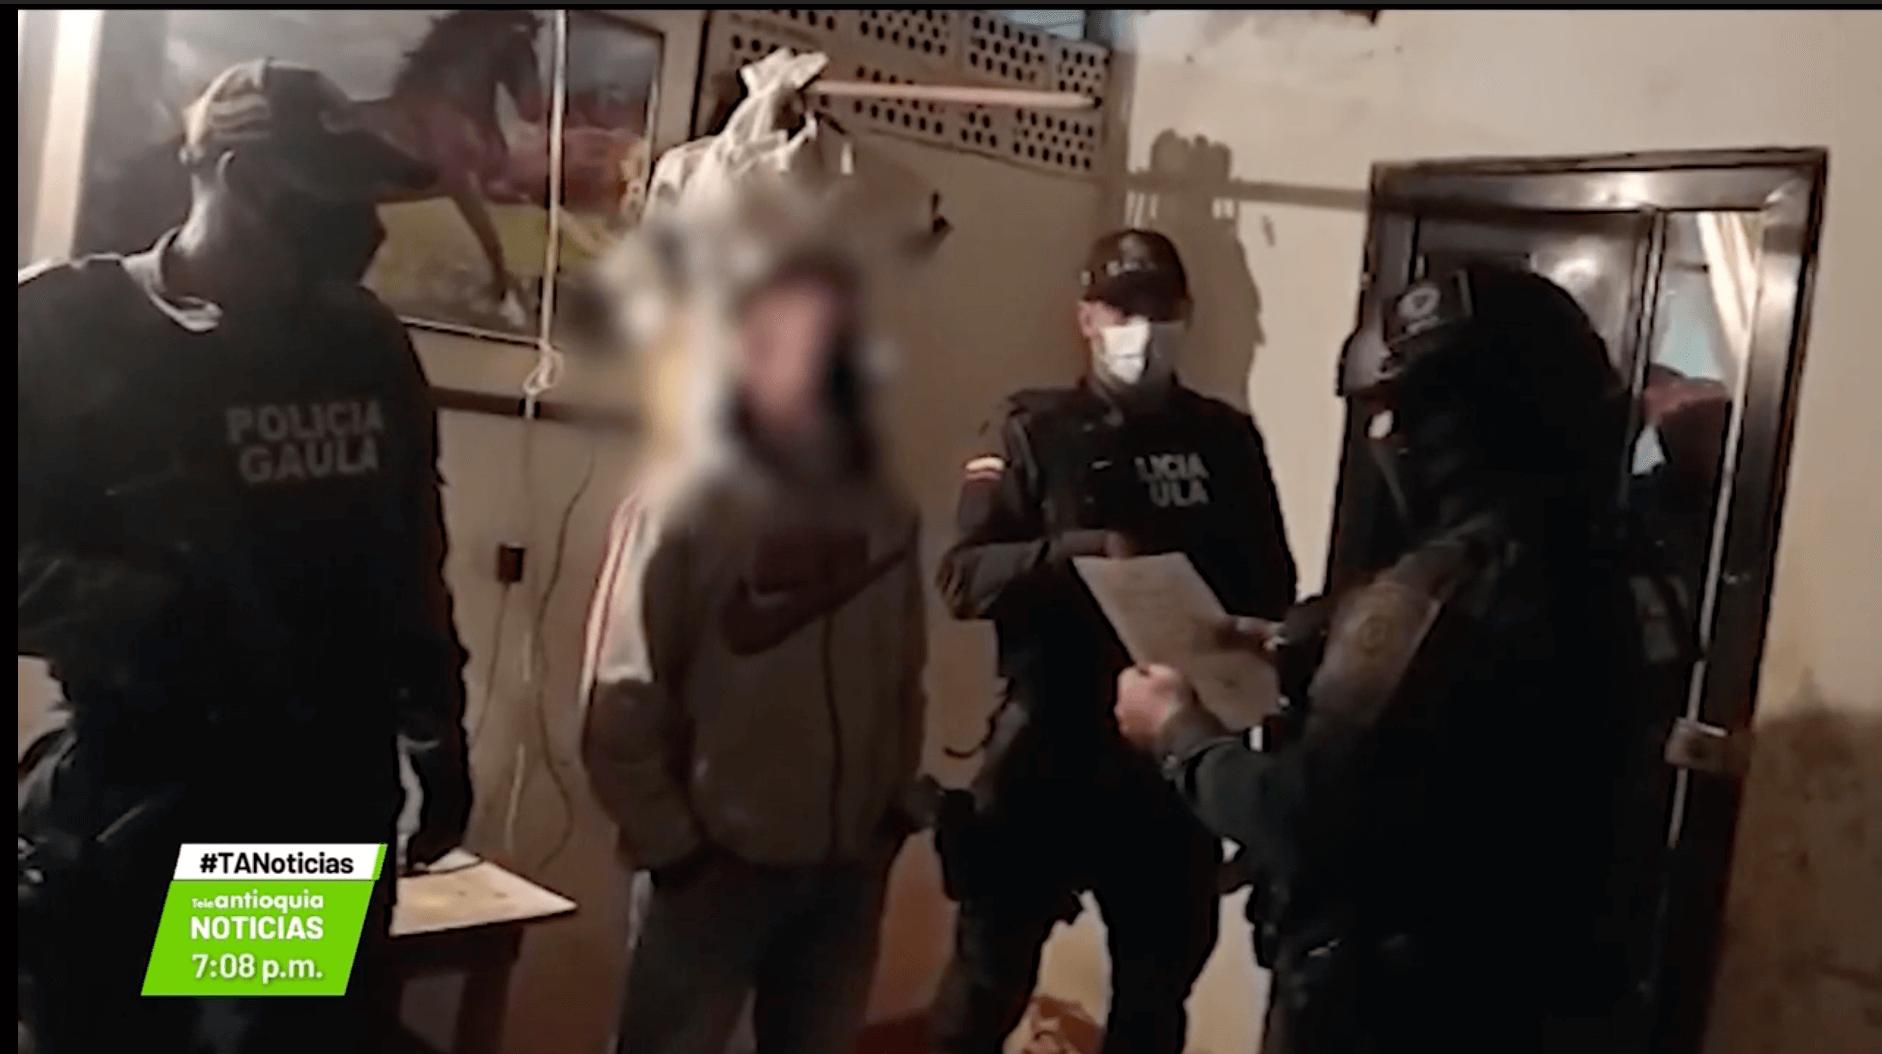 Cinco capturados por tráfico de estupefacientes